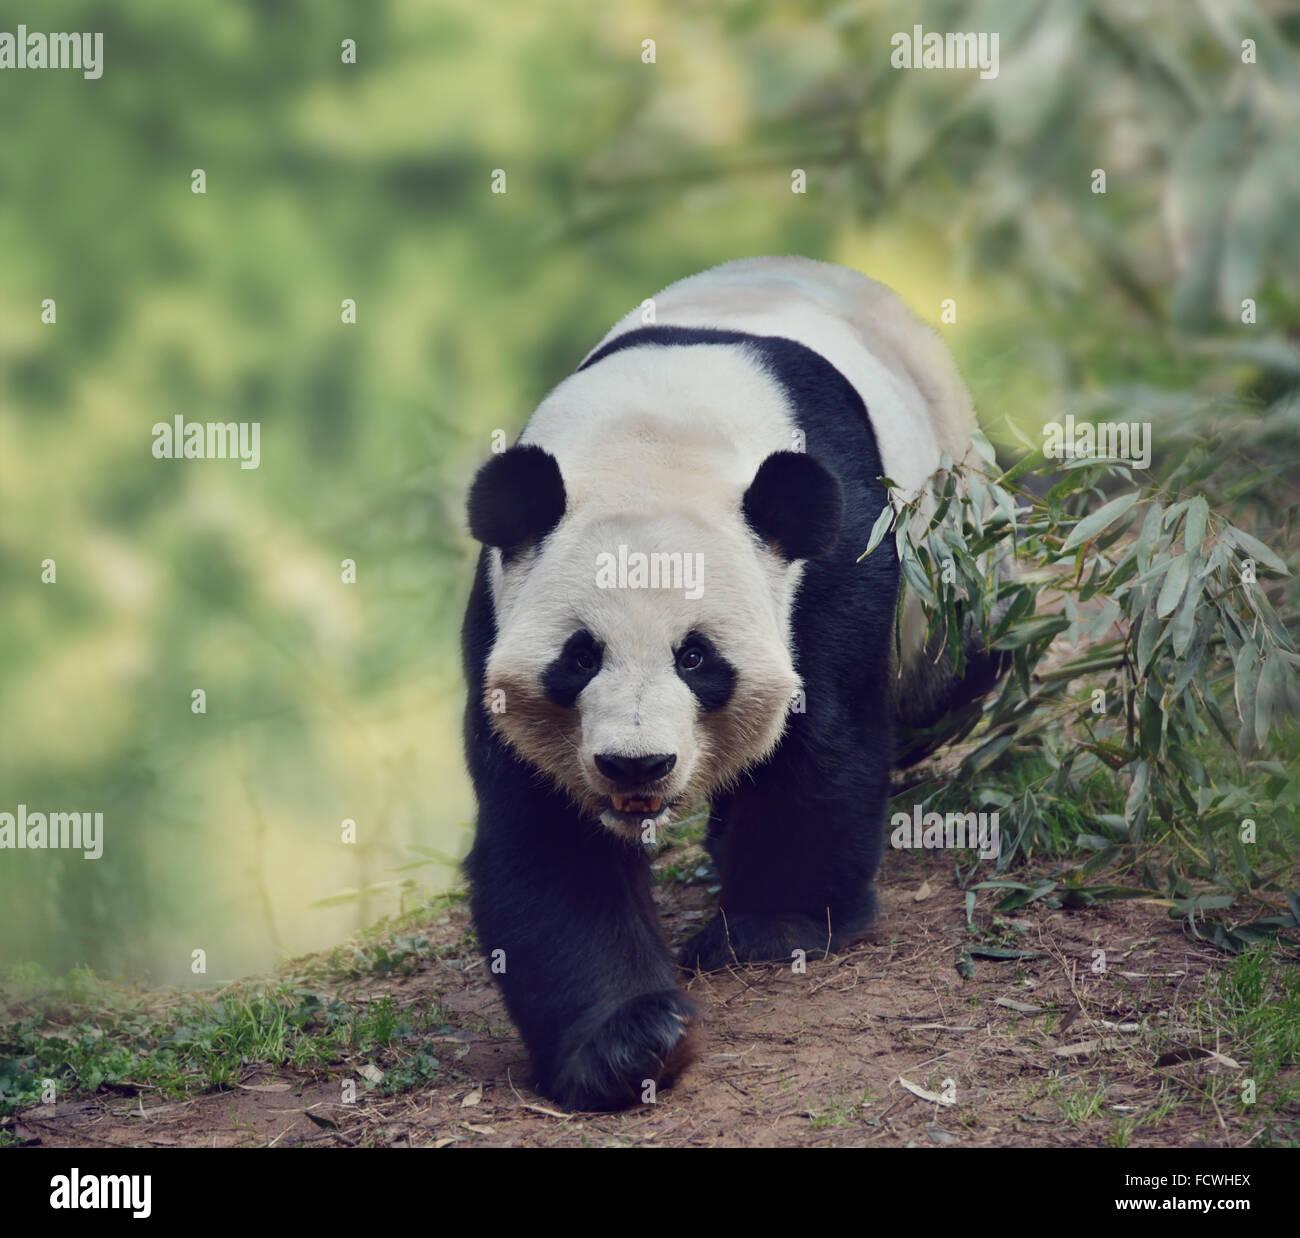 Giant Panda Bear Walking in the Woods - Stock Image